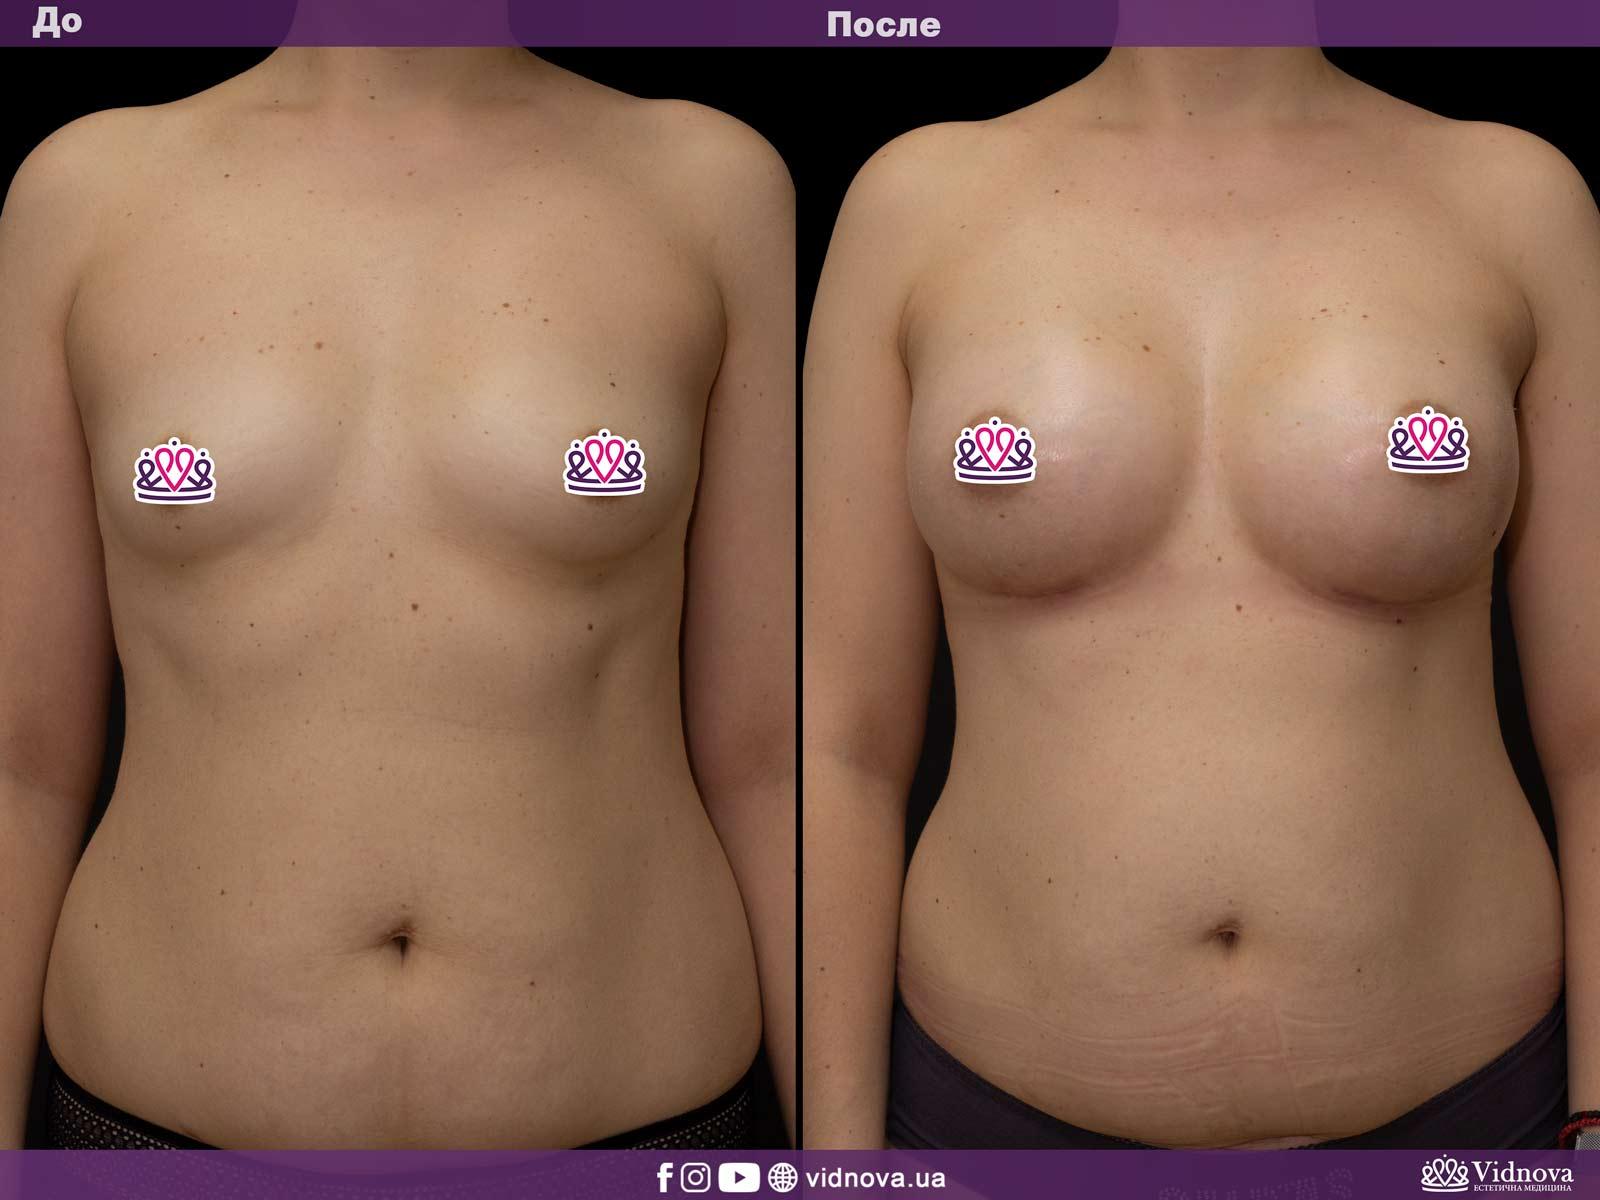 Увеличение груди: Фото ДО и ПОСЛЕ - Пример №23-1 - Клиника Vidnova